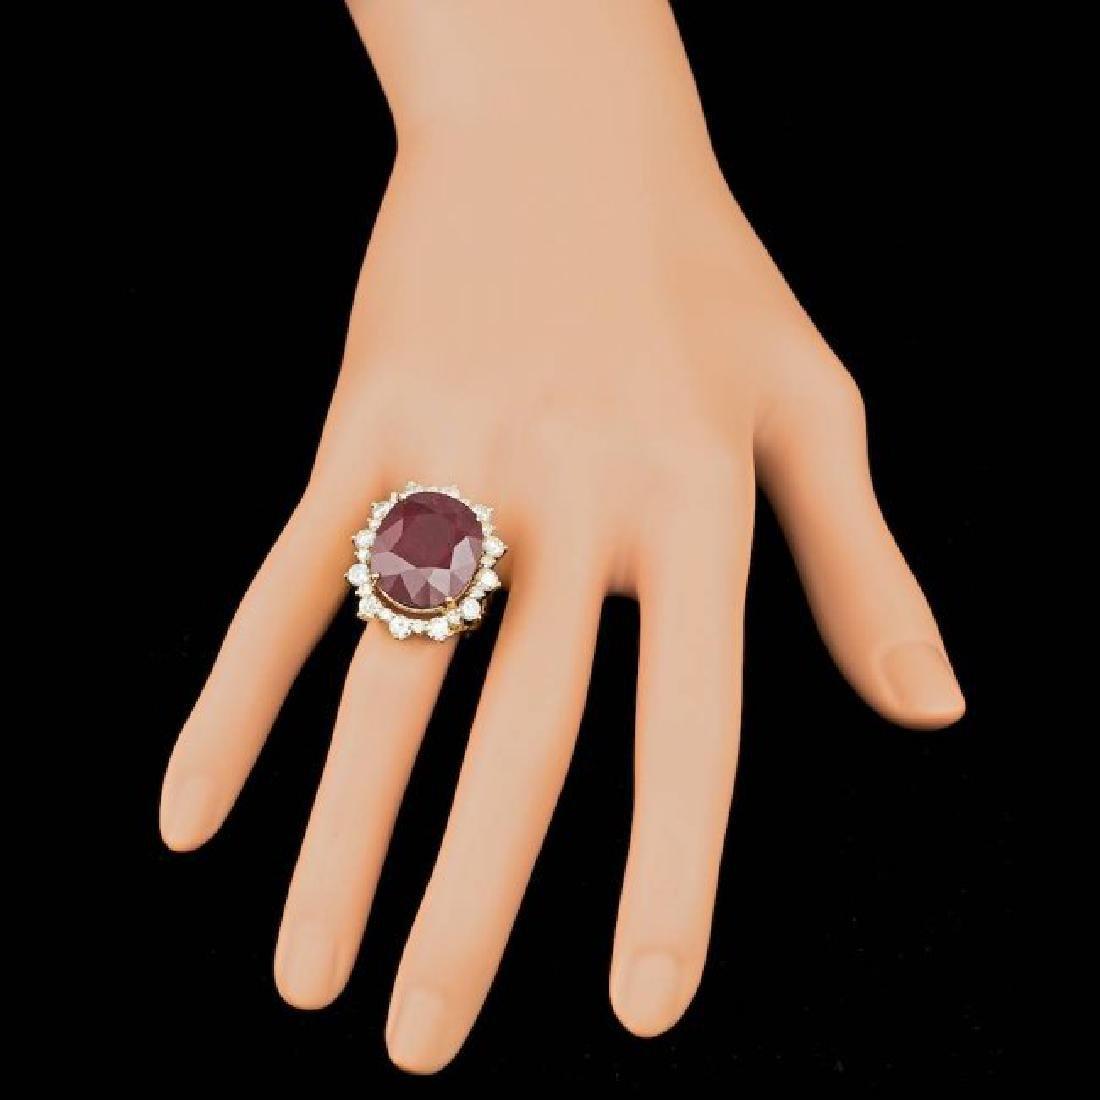 14k Yellow Gold 25.50ct Ruby 2.25ct Diamond Ring - 3